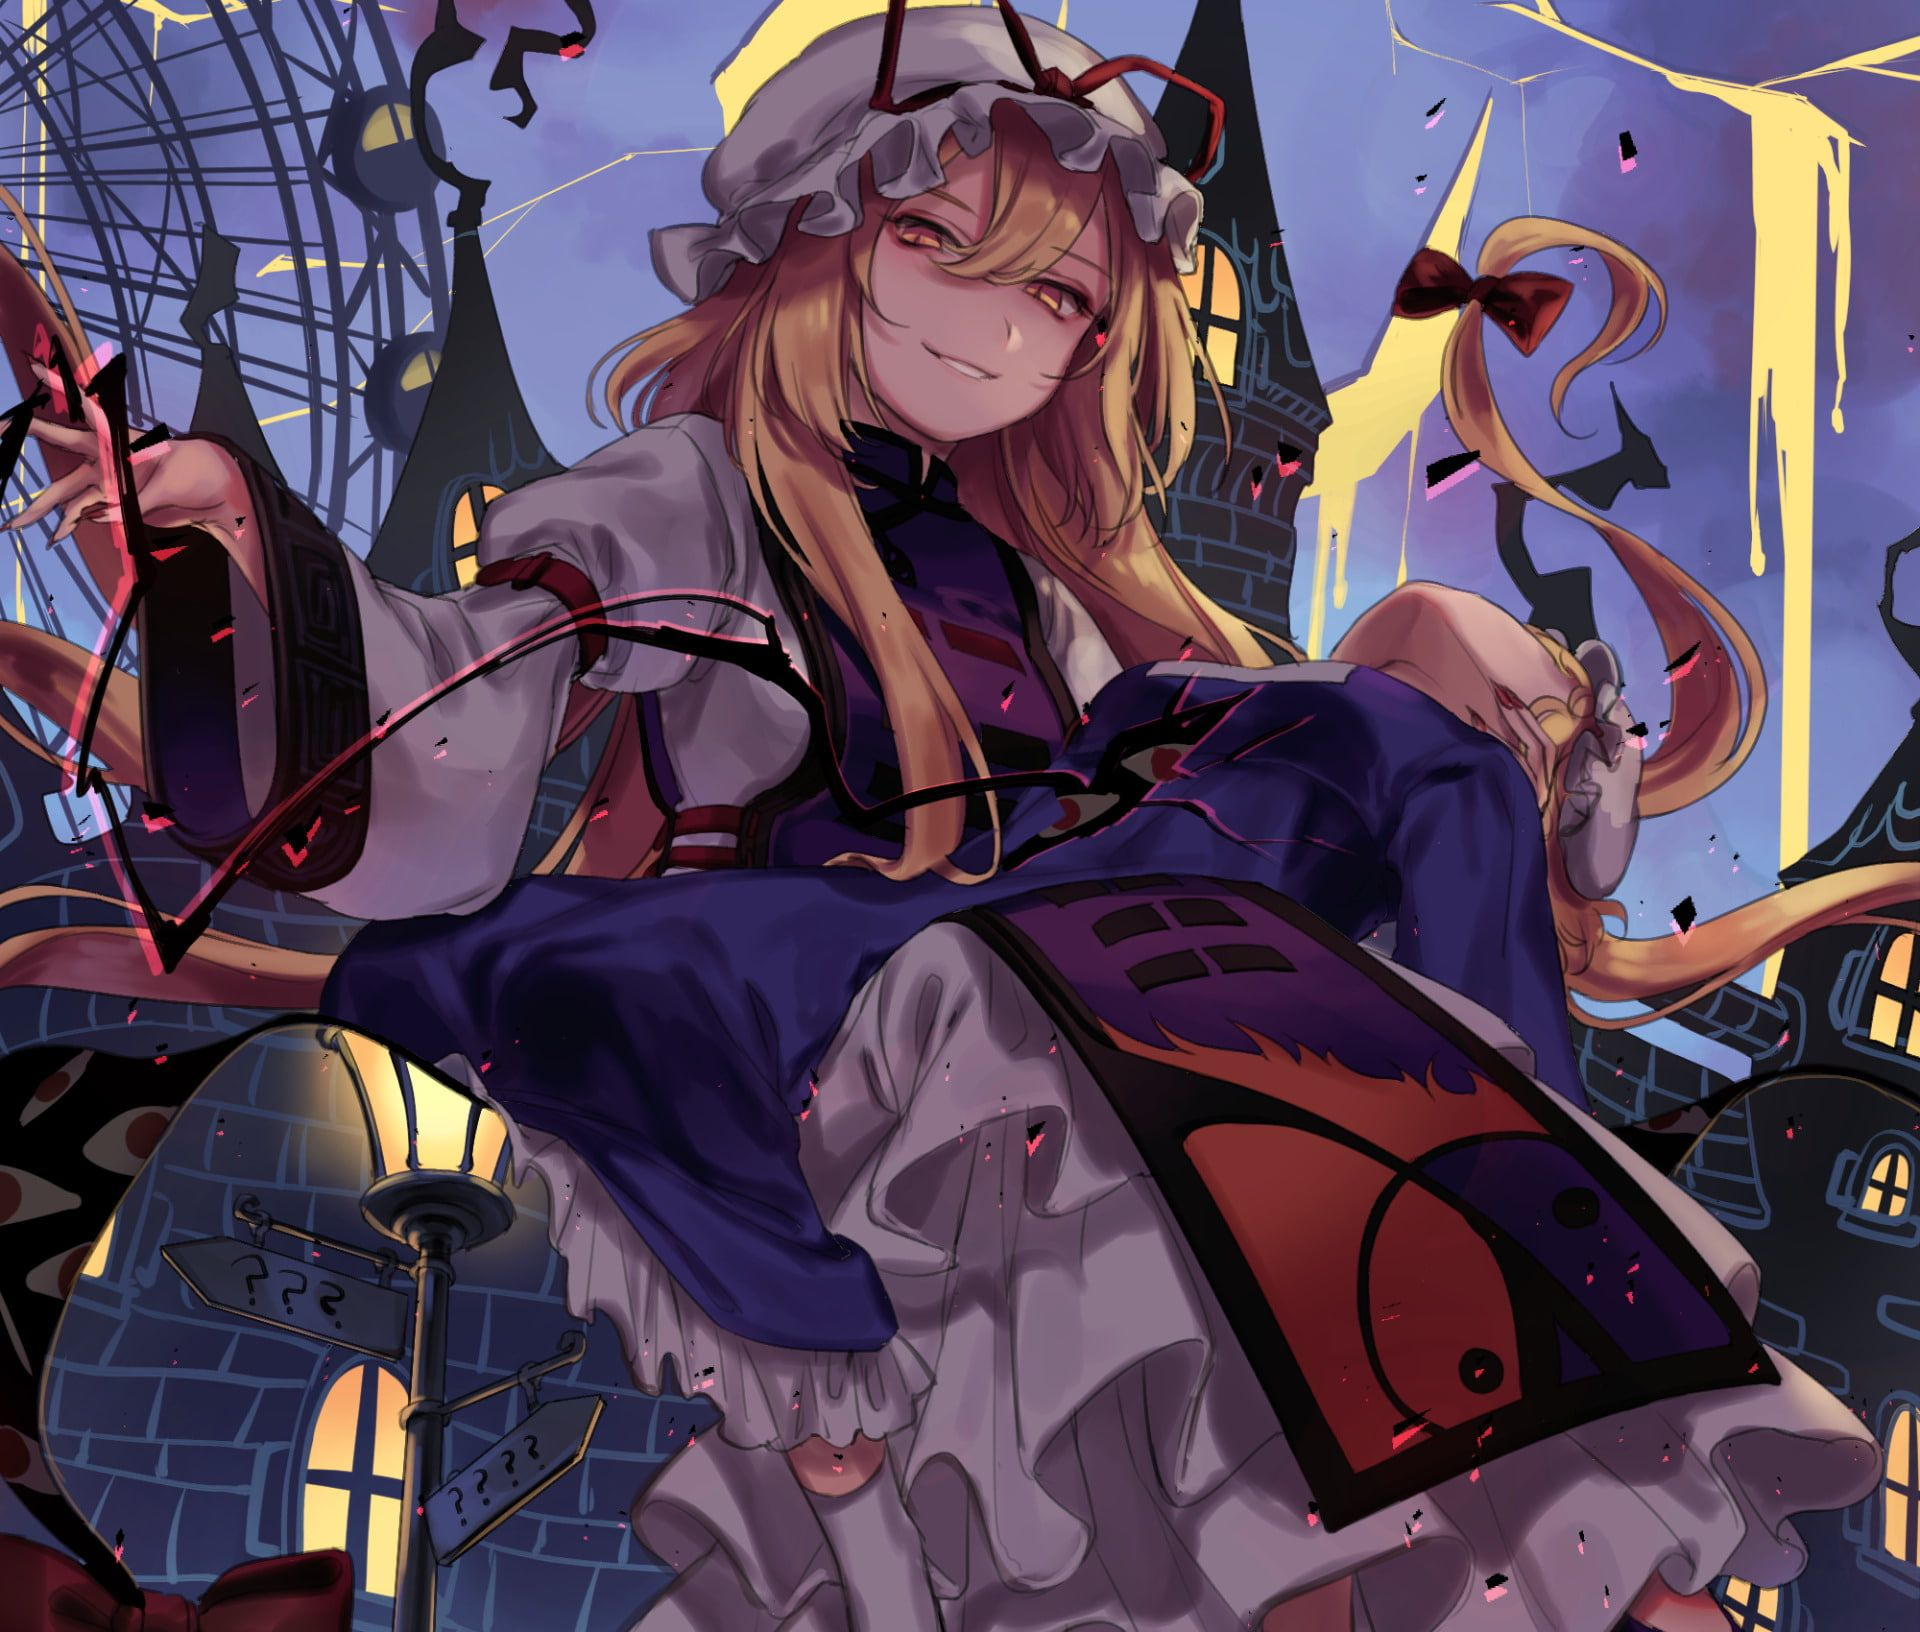 Anime Touhou Maribel Hearn Yukari Yakumo 1080p Wallpaper Hdwallpaper Desktop Anime Art Fantasy Anime Anime Artwork Wallpaper